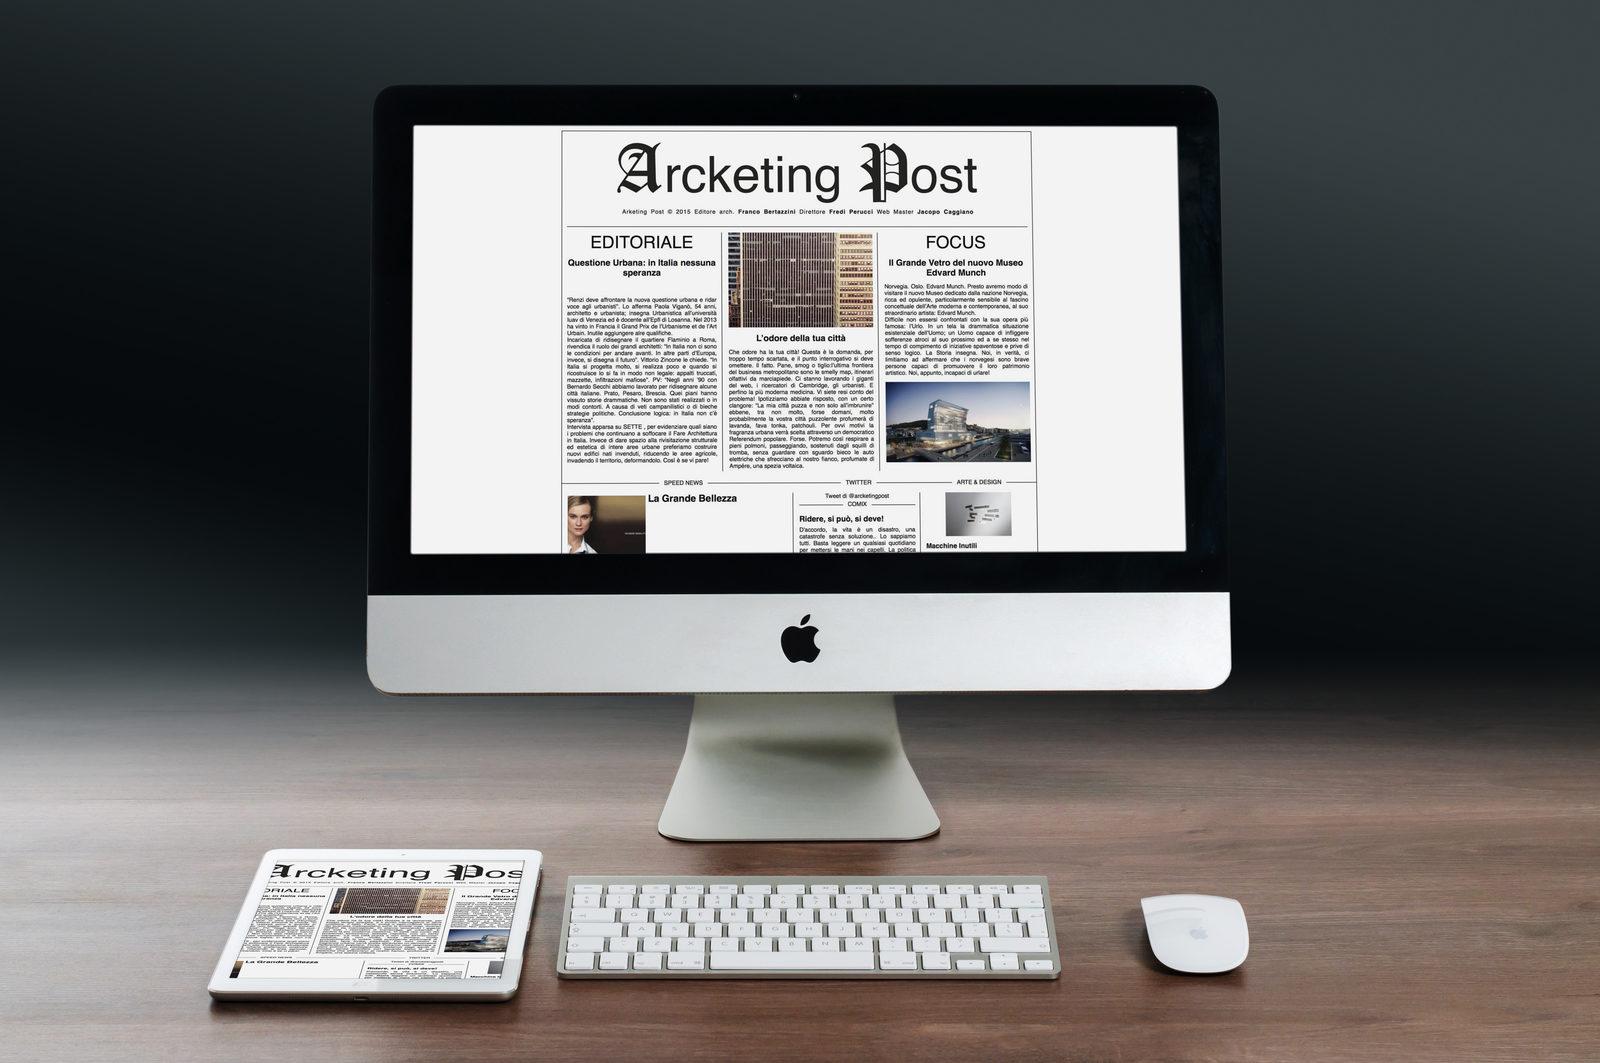 Arcketing Post web site